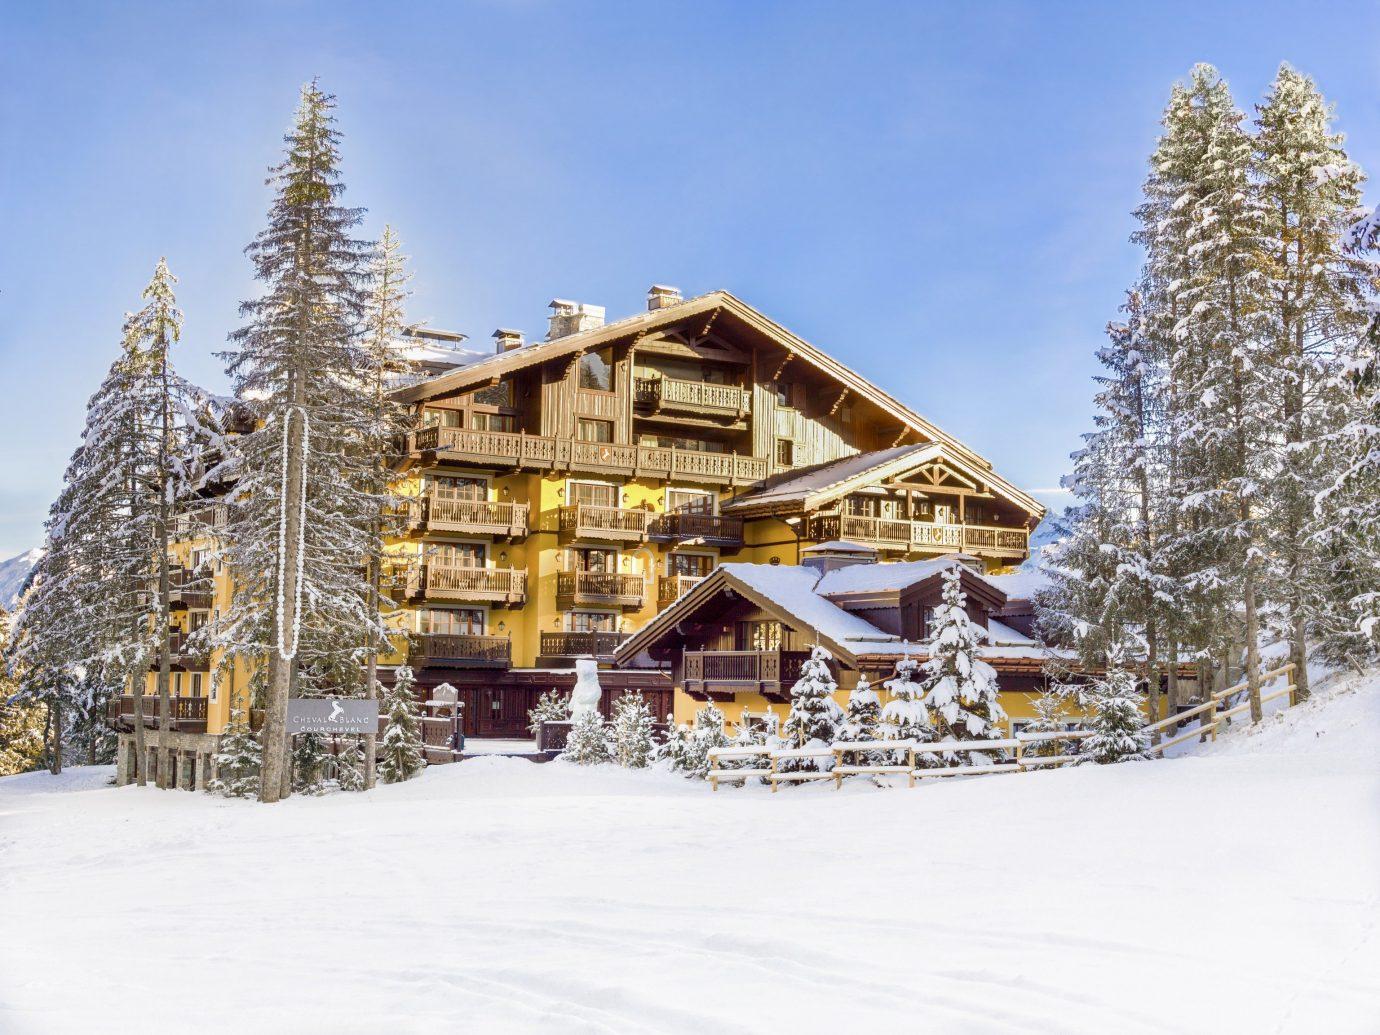 Hotels Luxury Travel Mountains + Skiing outdoor snow sky tree Winter piste geological phenomenon Resort season log cabin ride